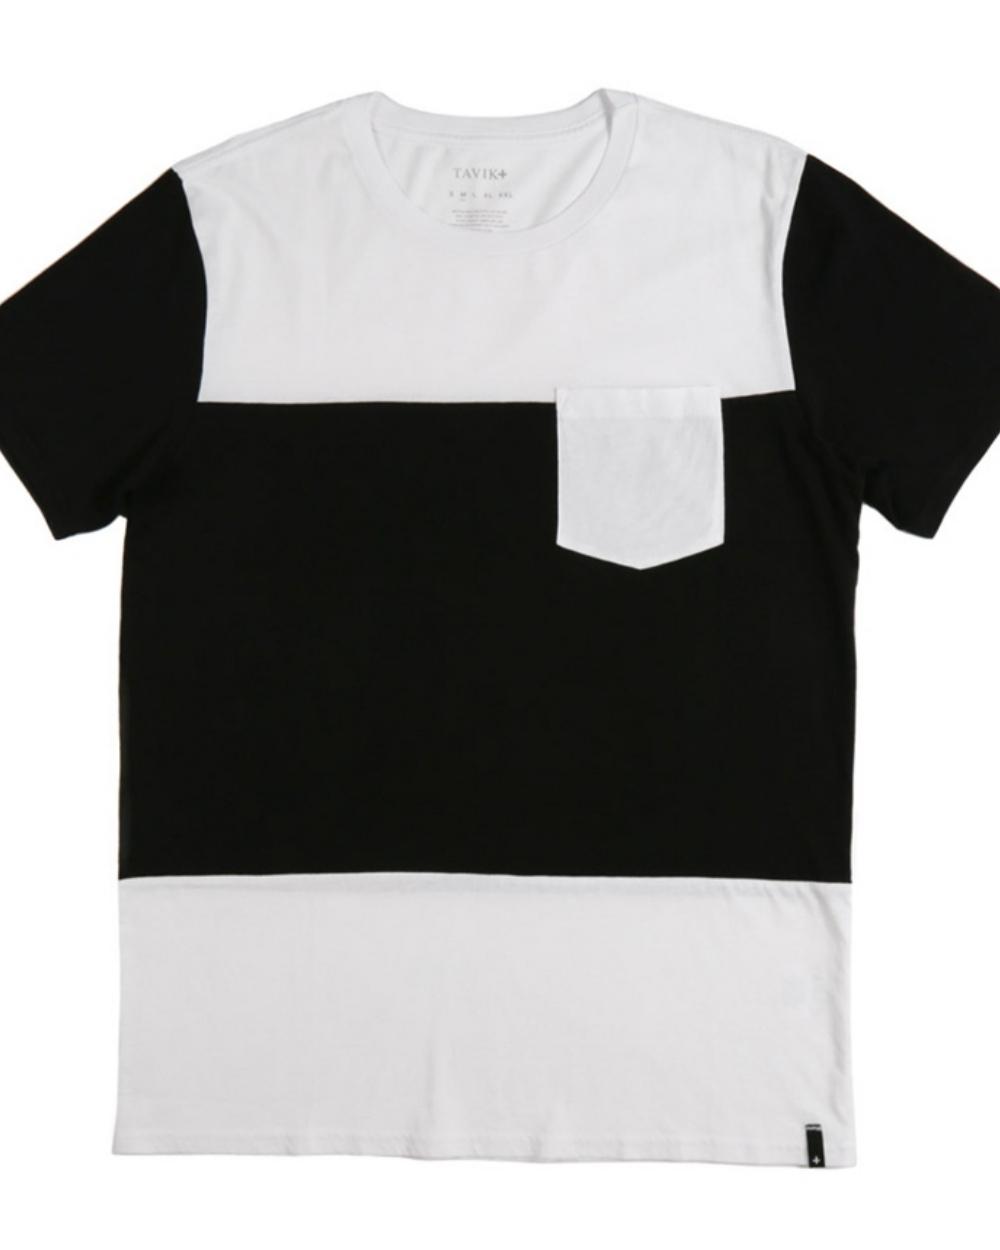 2015 Tavik Men's Parallax Knit T-Shirt